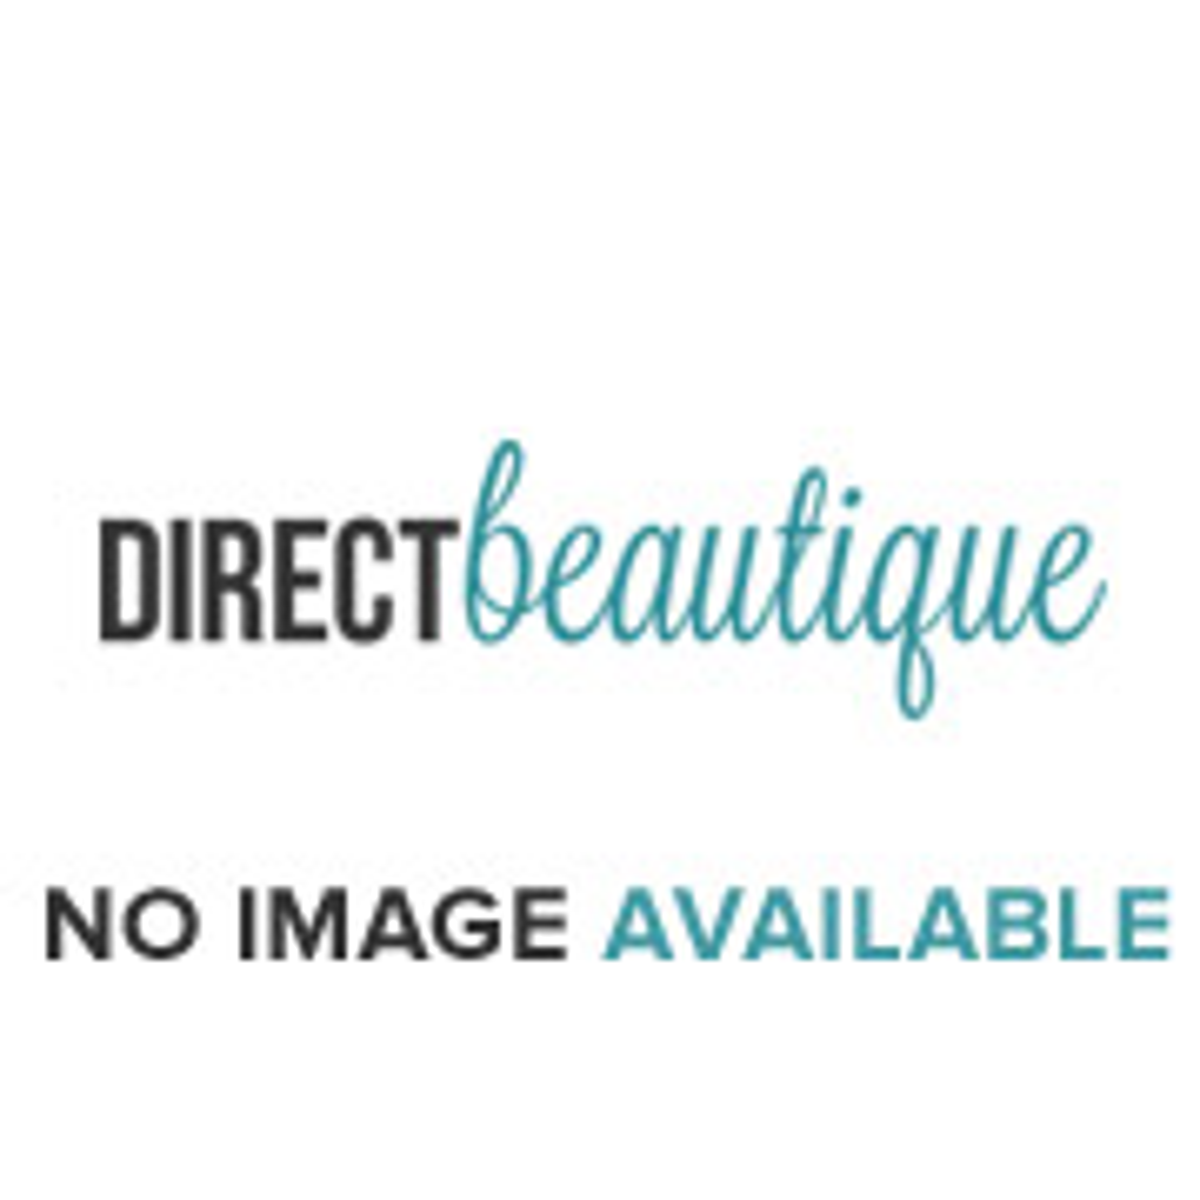 L'Oreal Loreal Tecni Art Pli Spray 200ml